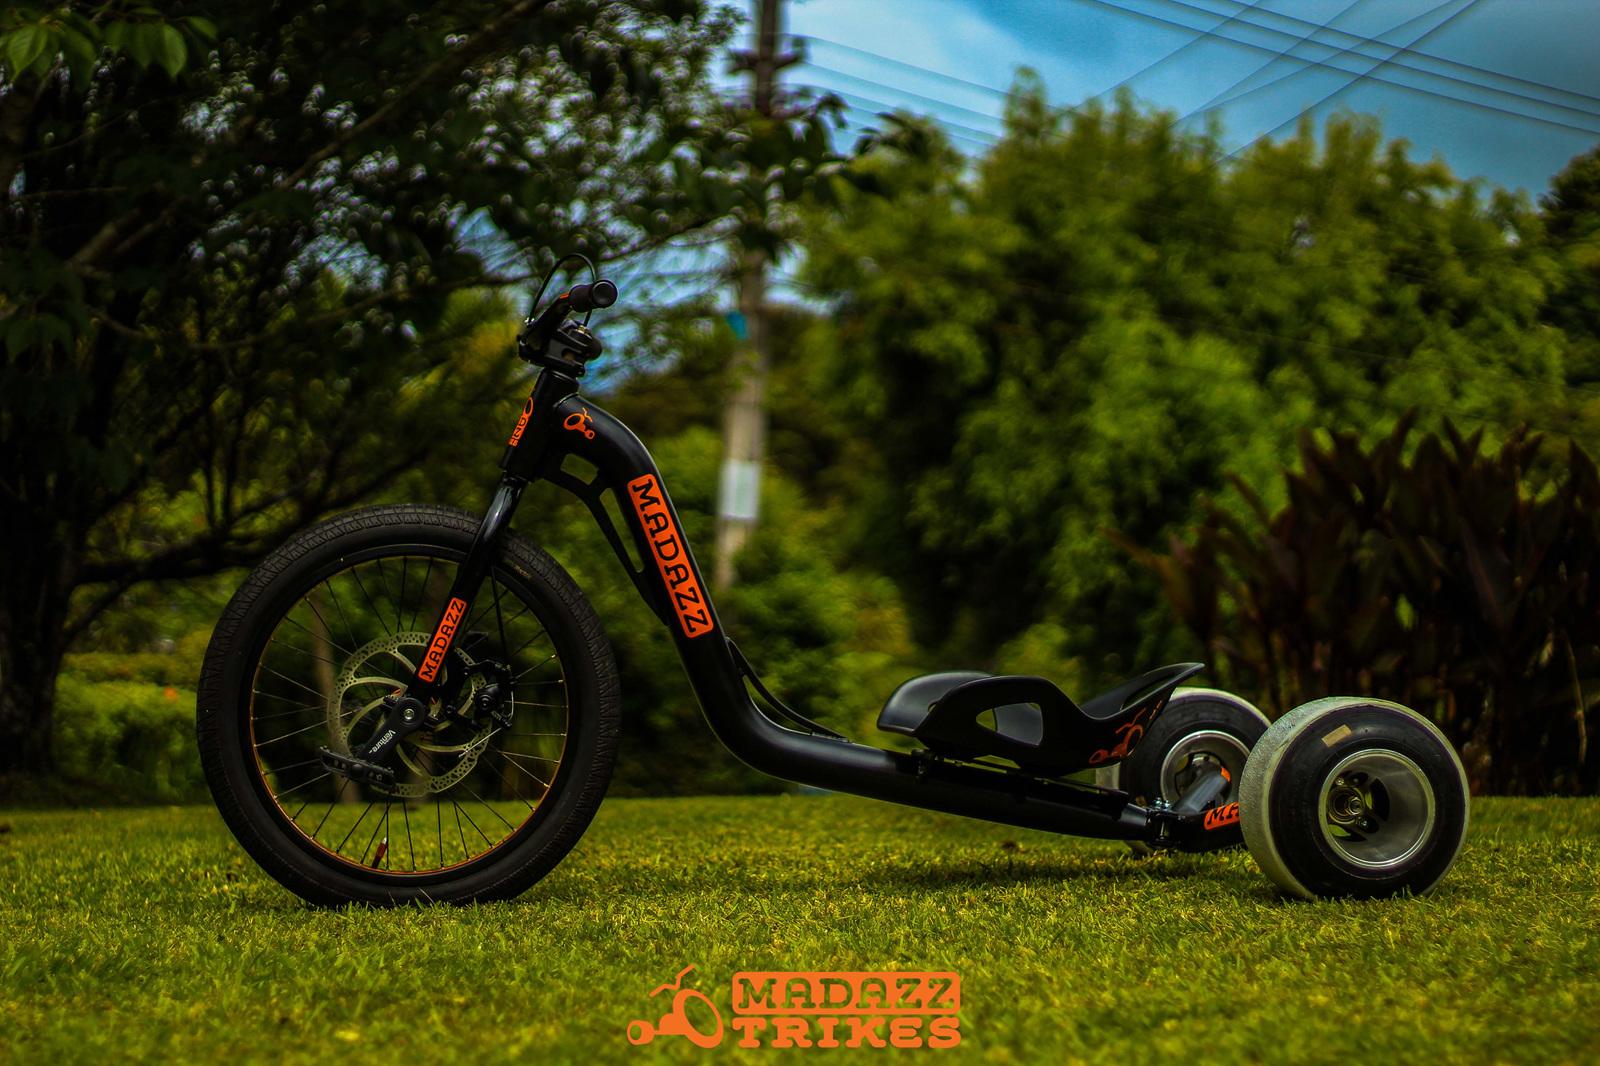 Madazz Spec 5™ Pro Drift Trike - Madazz Trikes